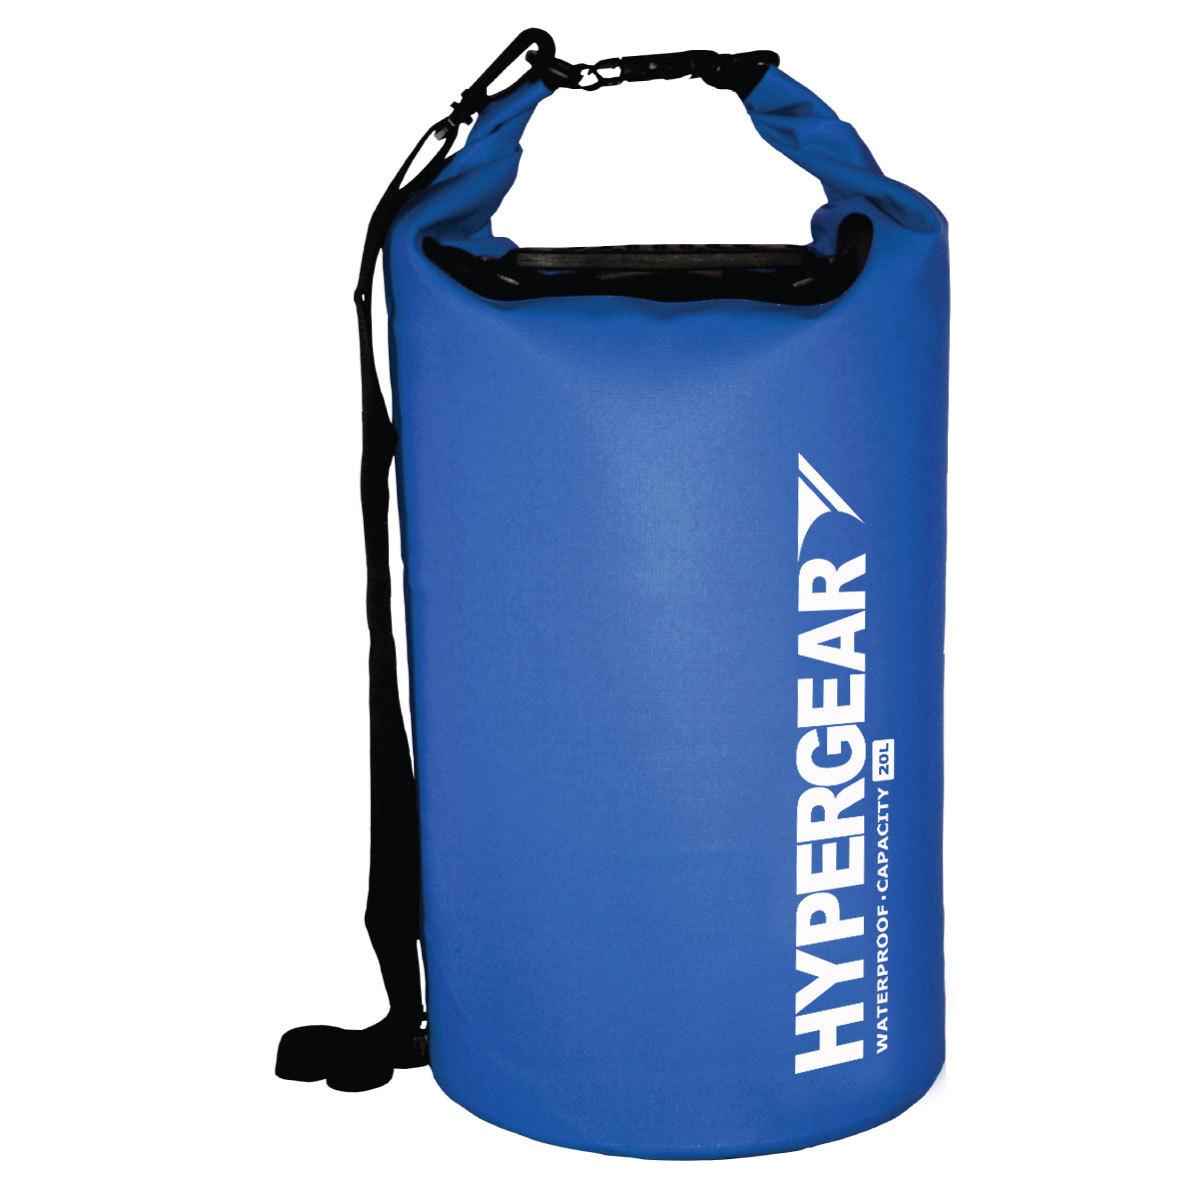 Hypergear 20L dry bags